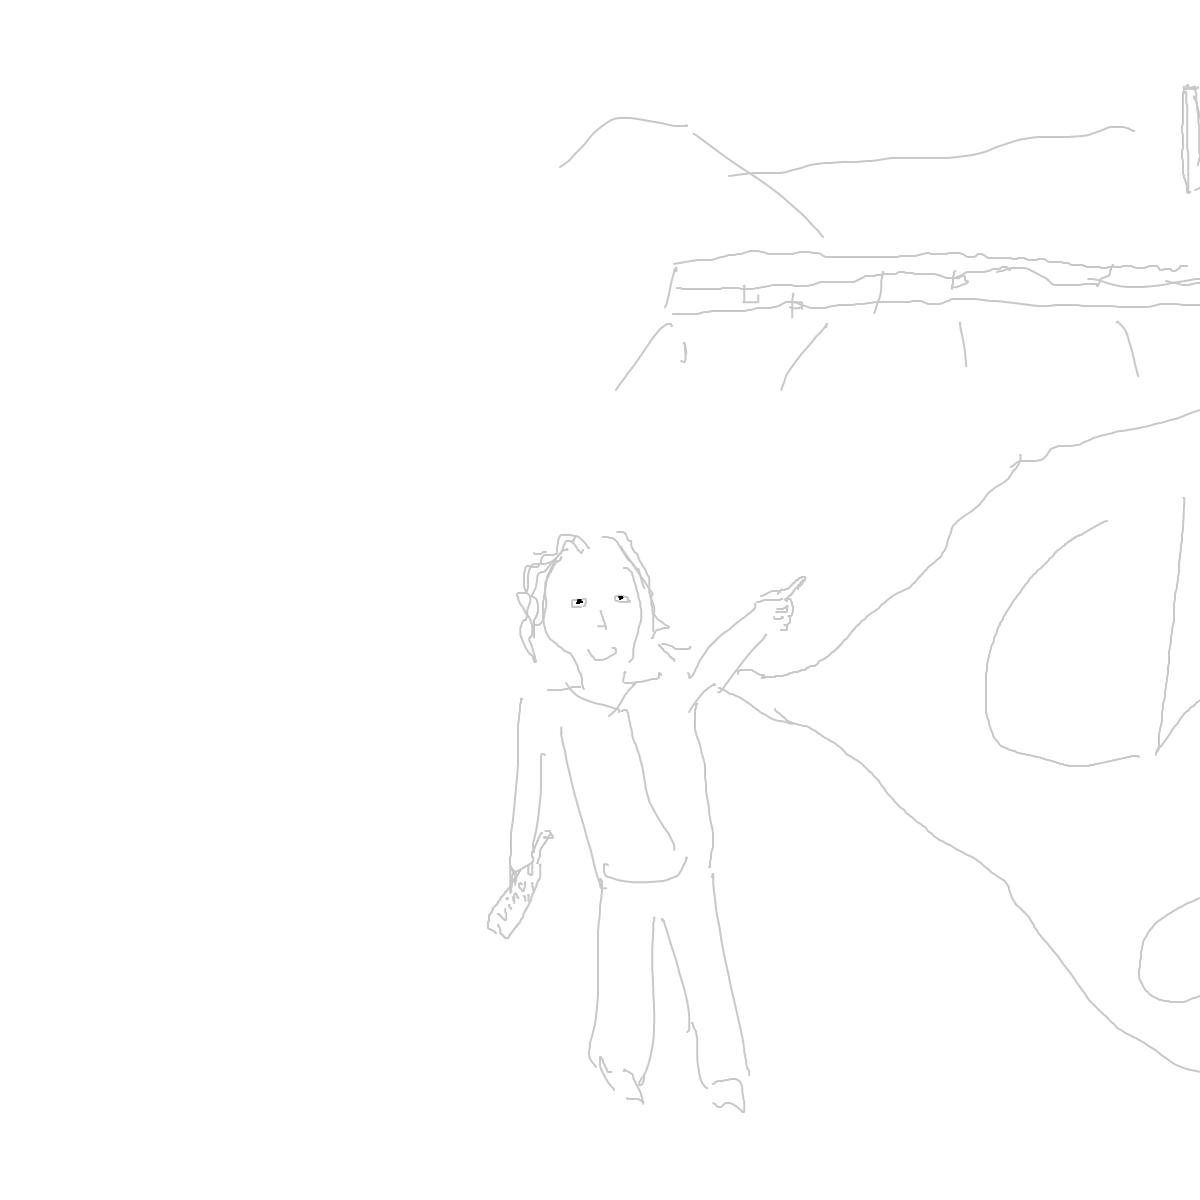 BAAAM drawing#9330 lat:41.7283744812011700lng: 13.2908277511596680